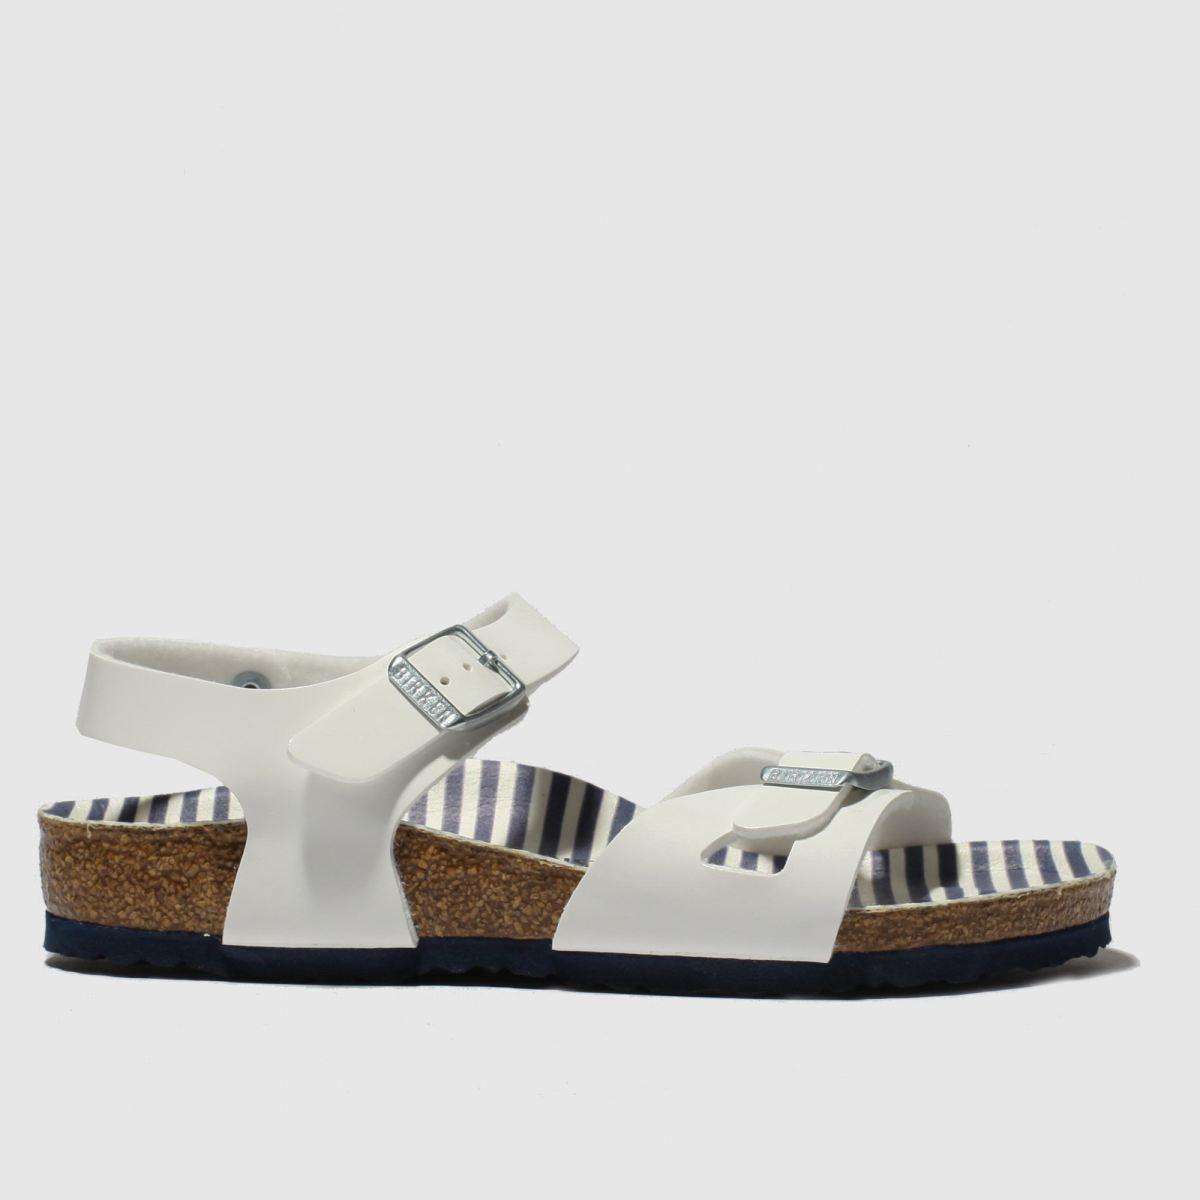 Birkenstock White & Blue Rio Sandals Junior